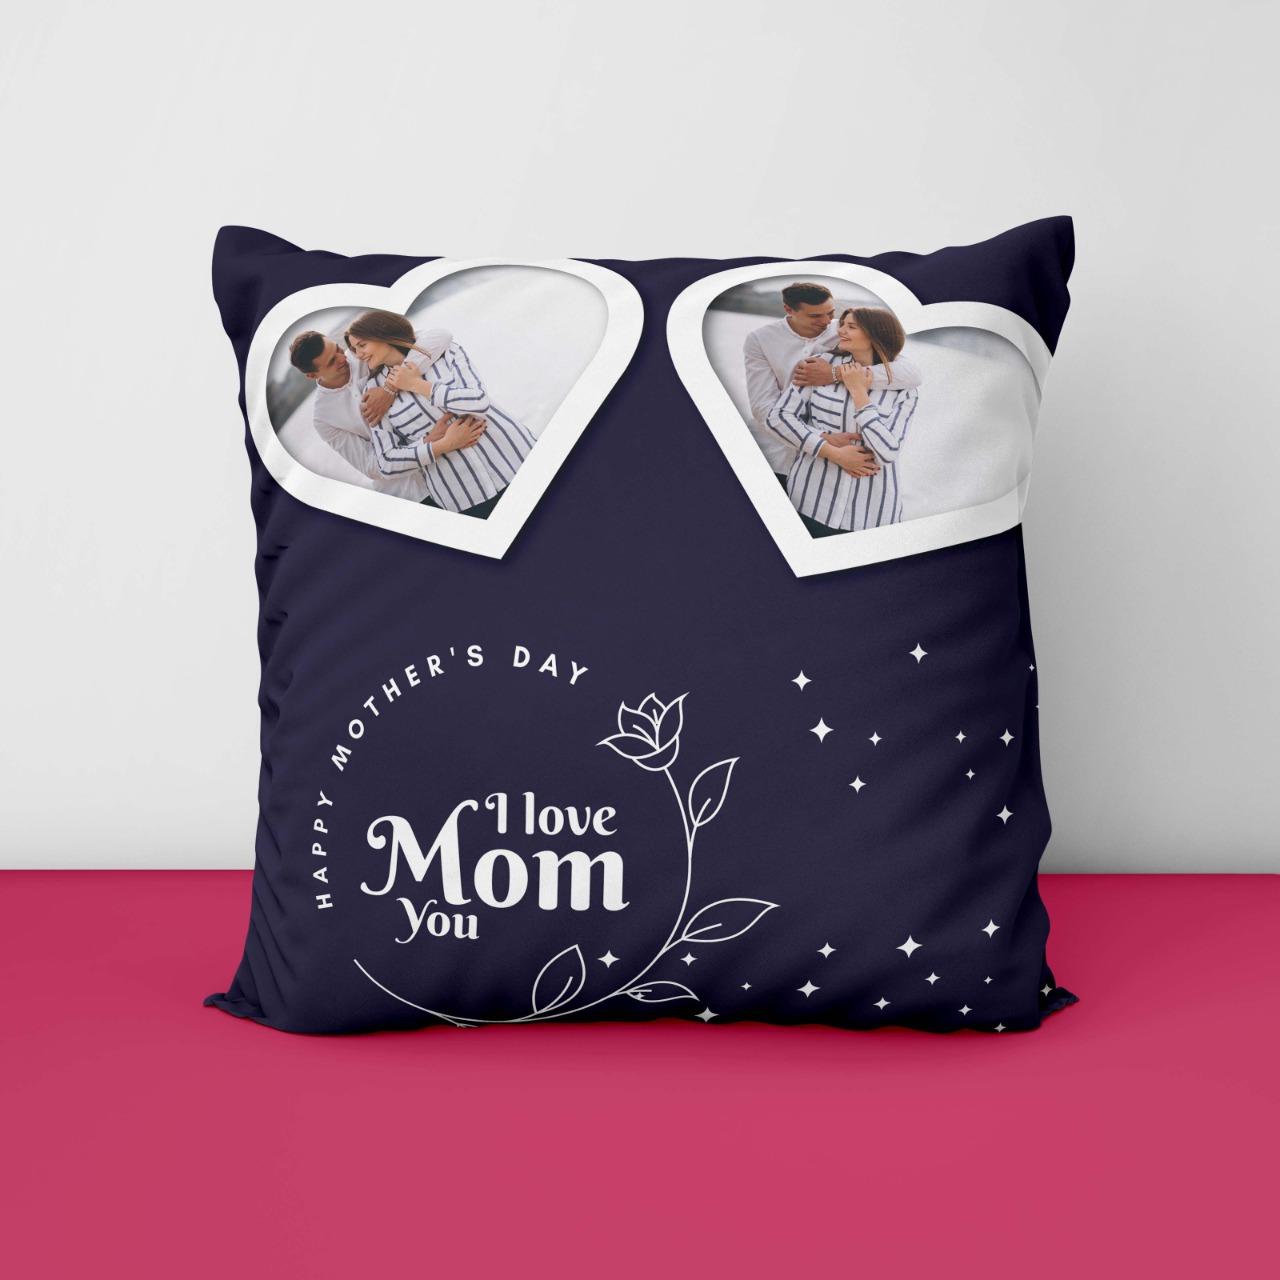 I Love Mom Personalized Cushion